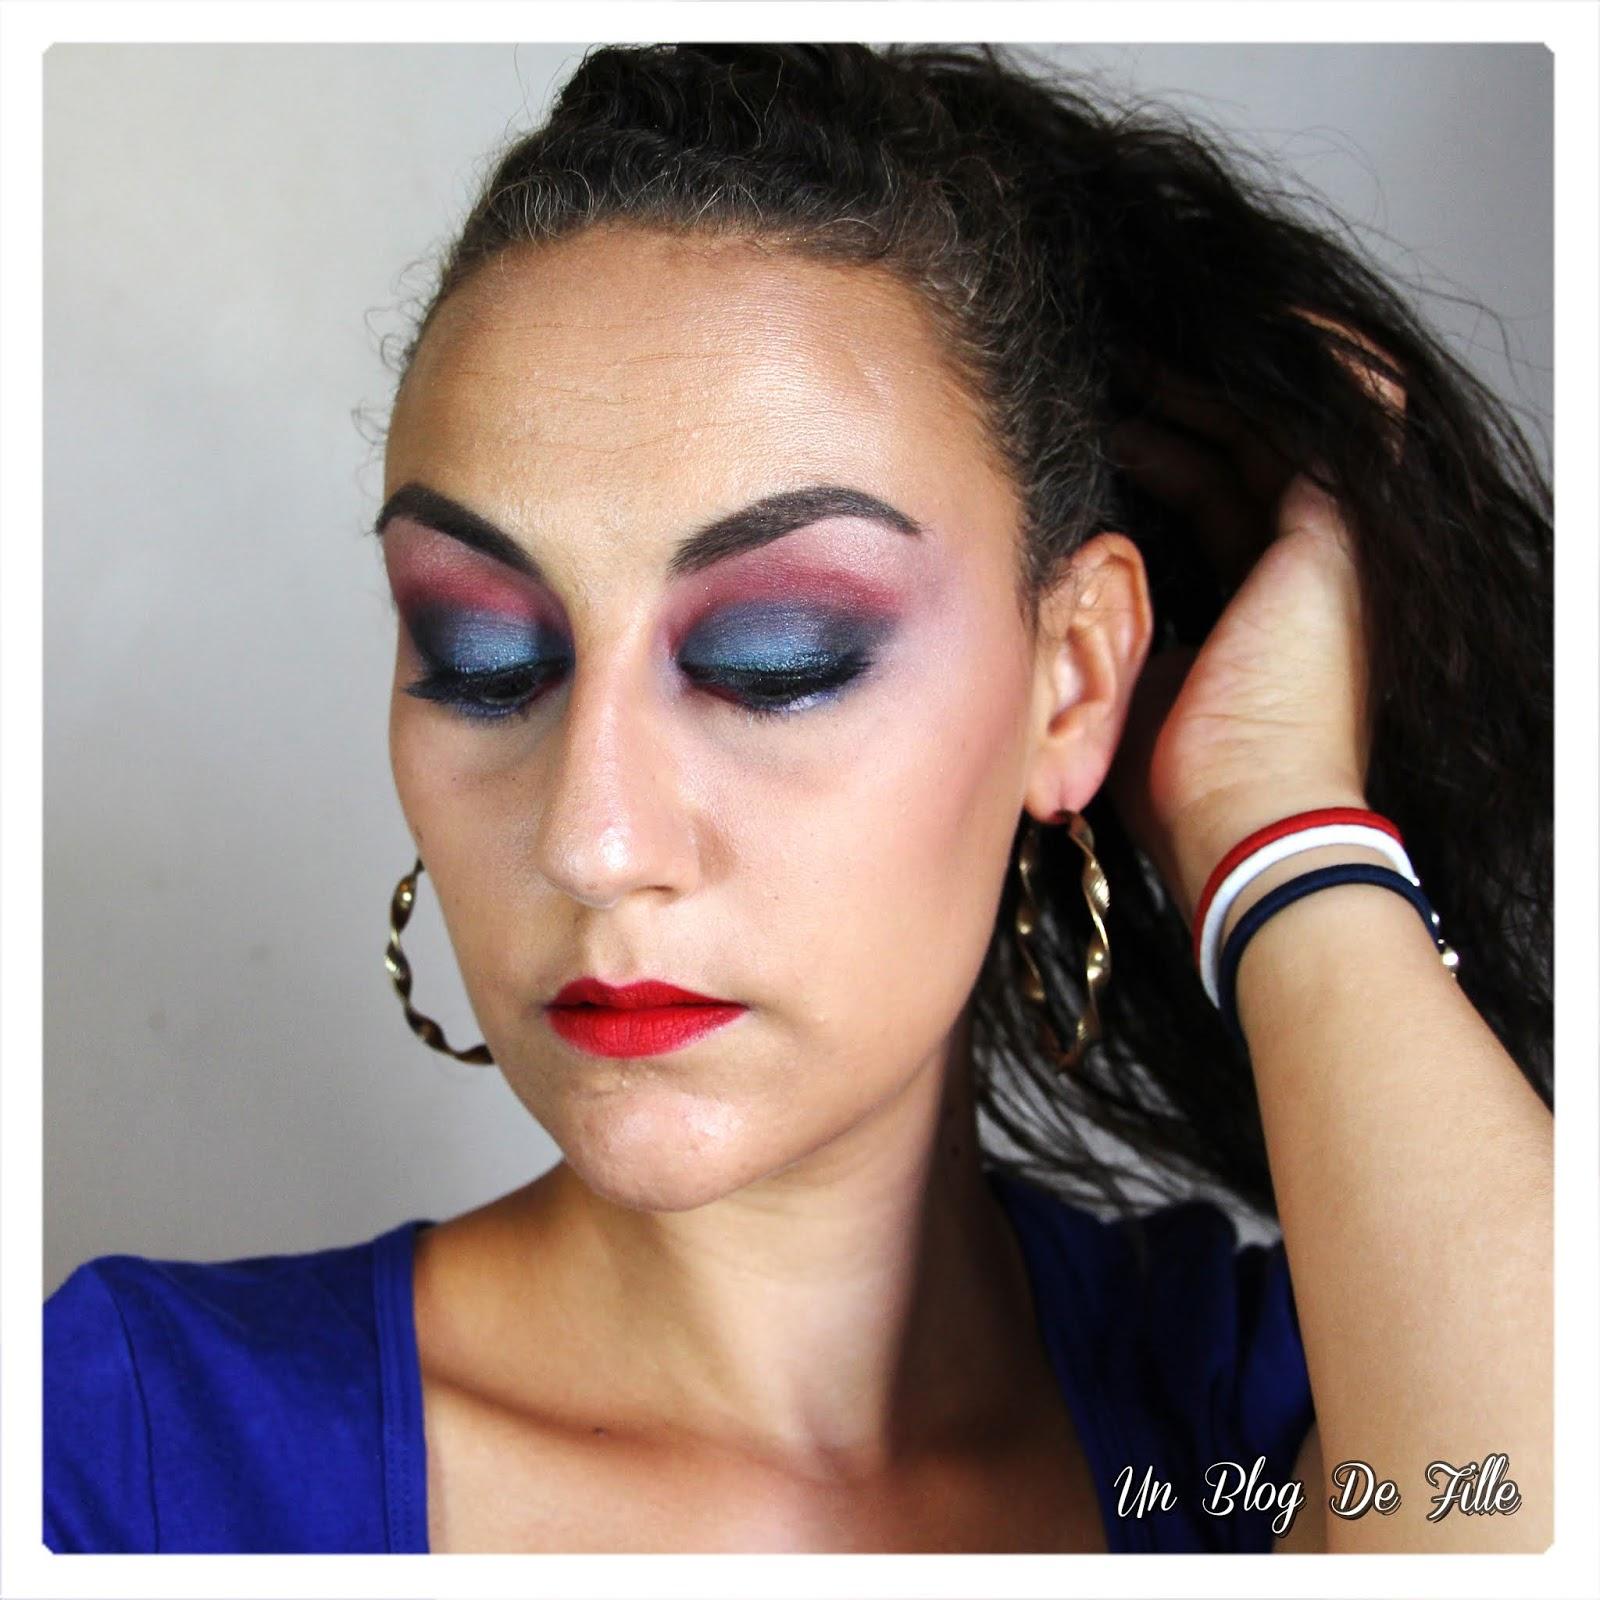 http://www.unblogdefille.fr/2018/07/maquillage-bleu-blanc-rouge-supporter.html